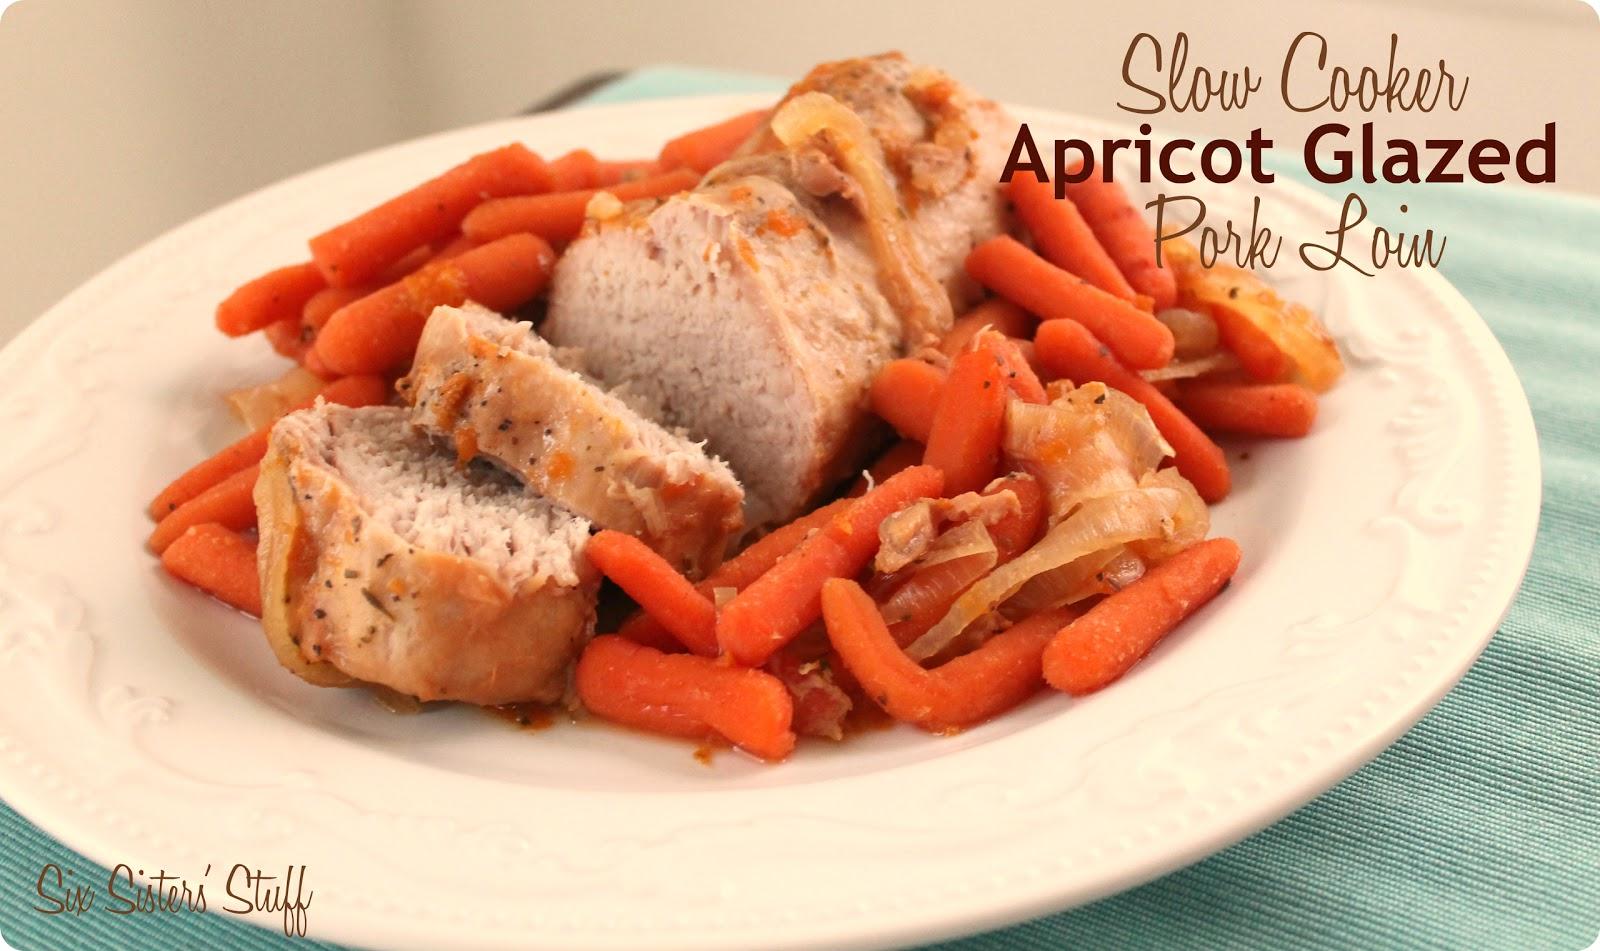 Apricot glazed pork tenderloin recipe